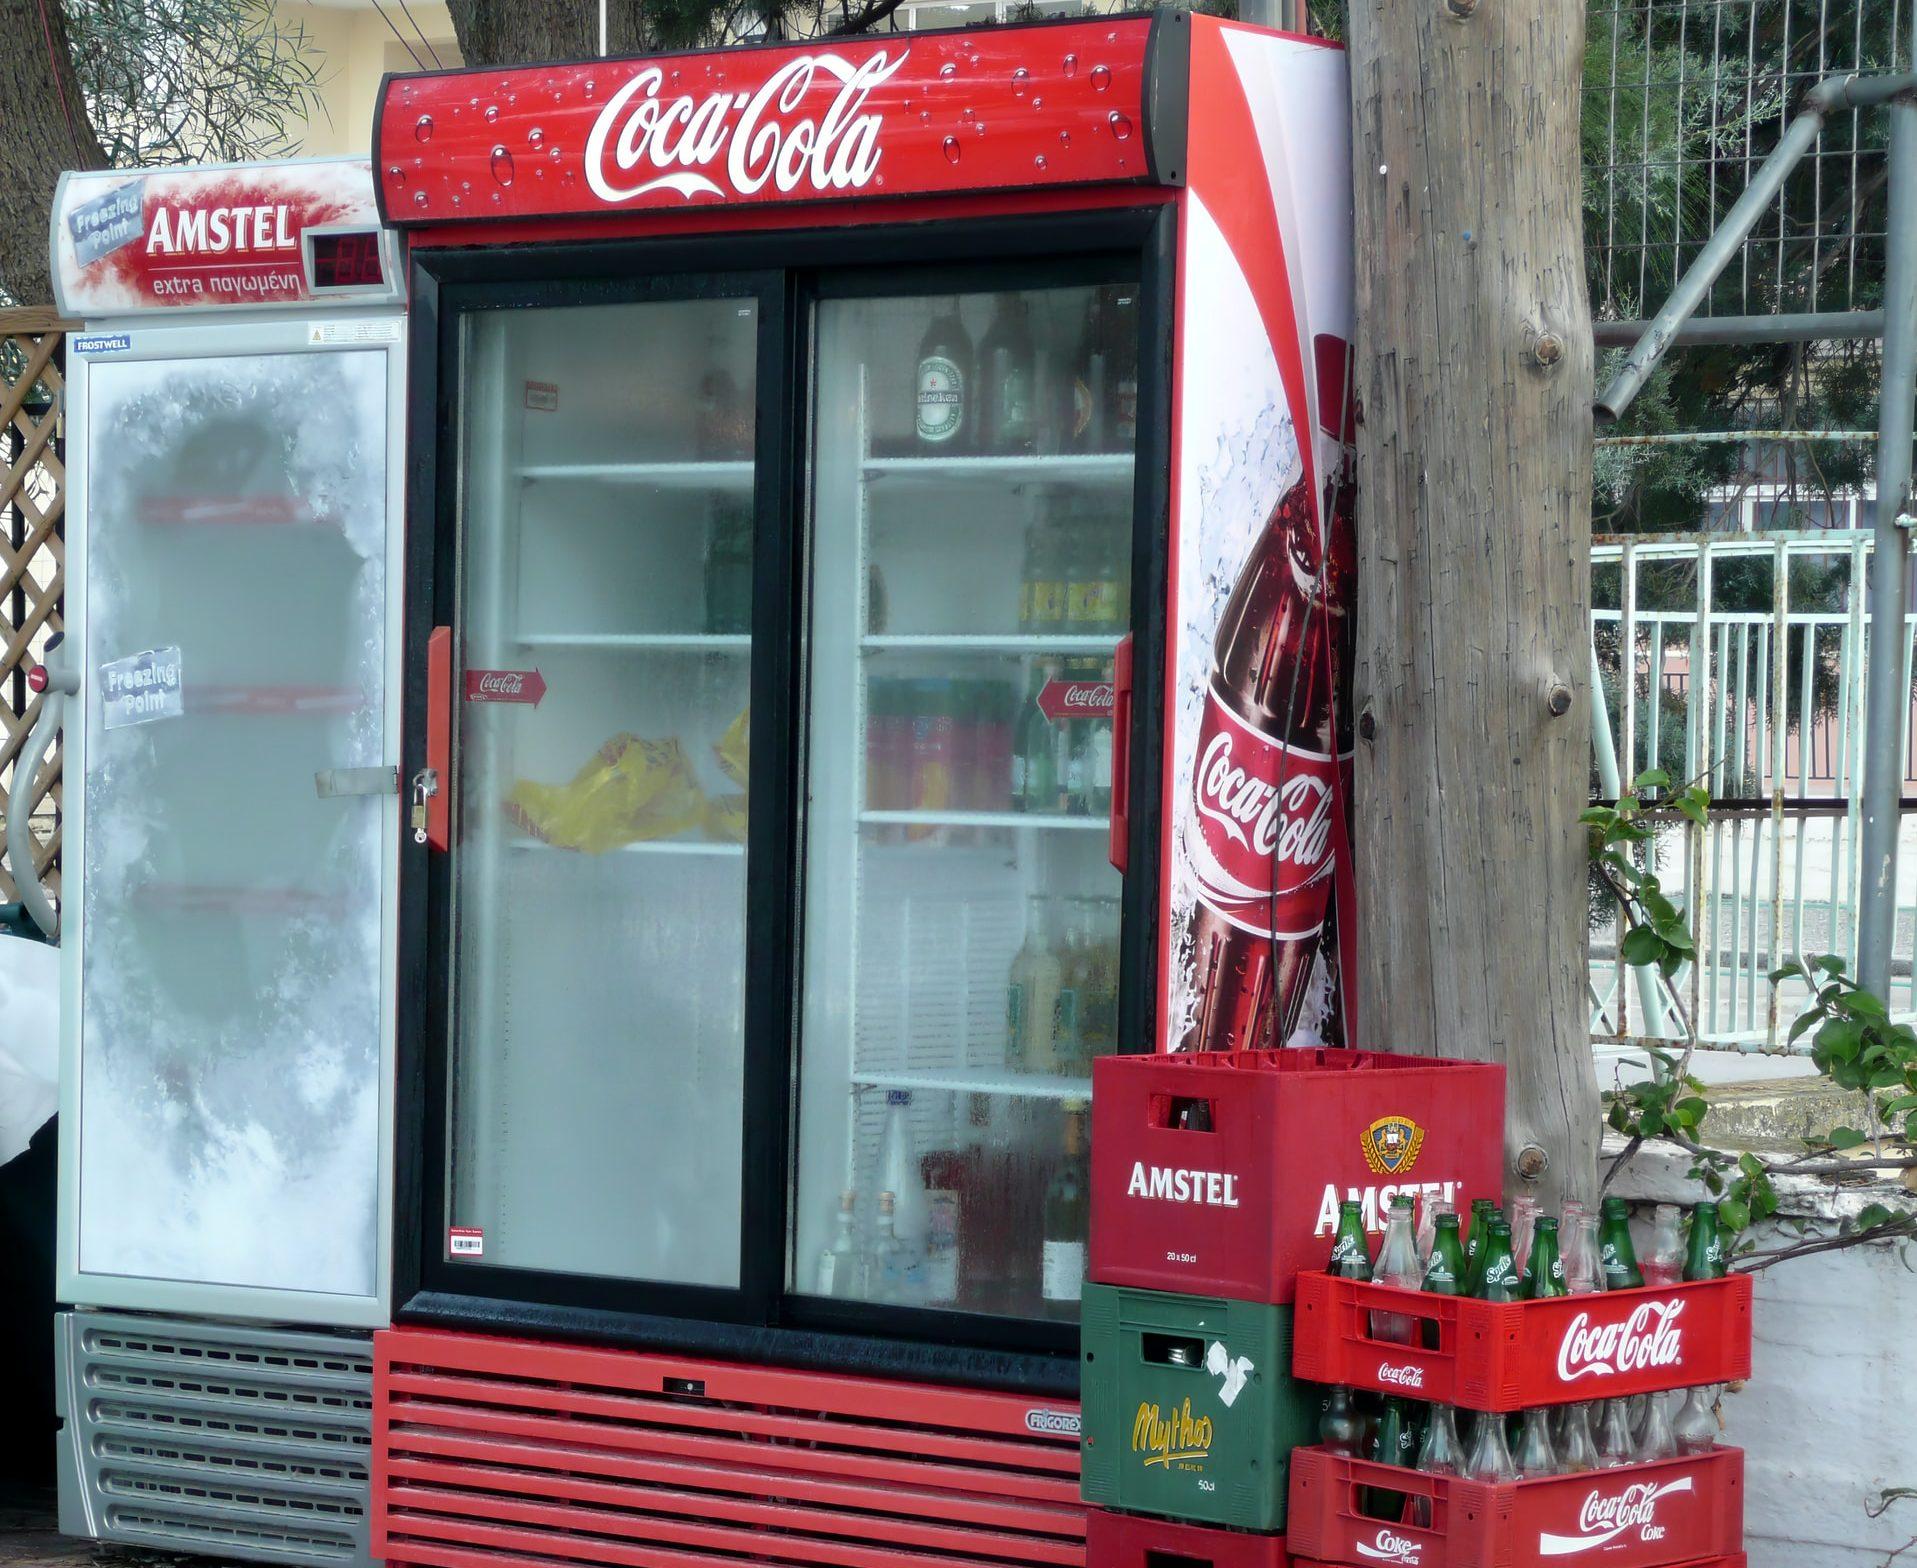 A fridge by Coca Cola